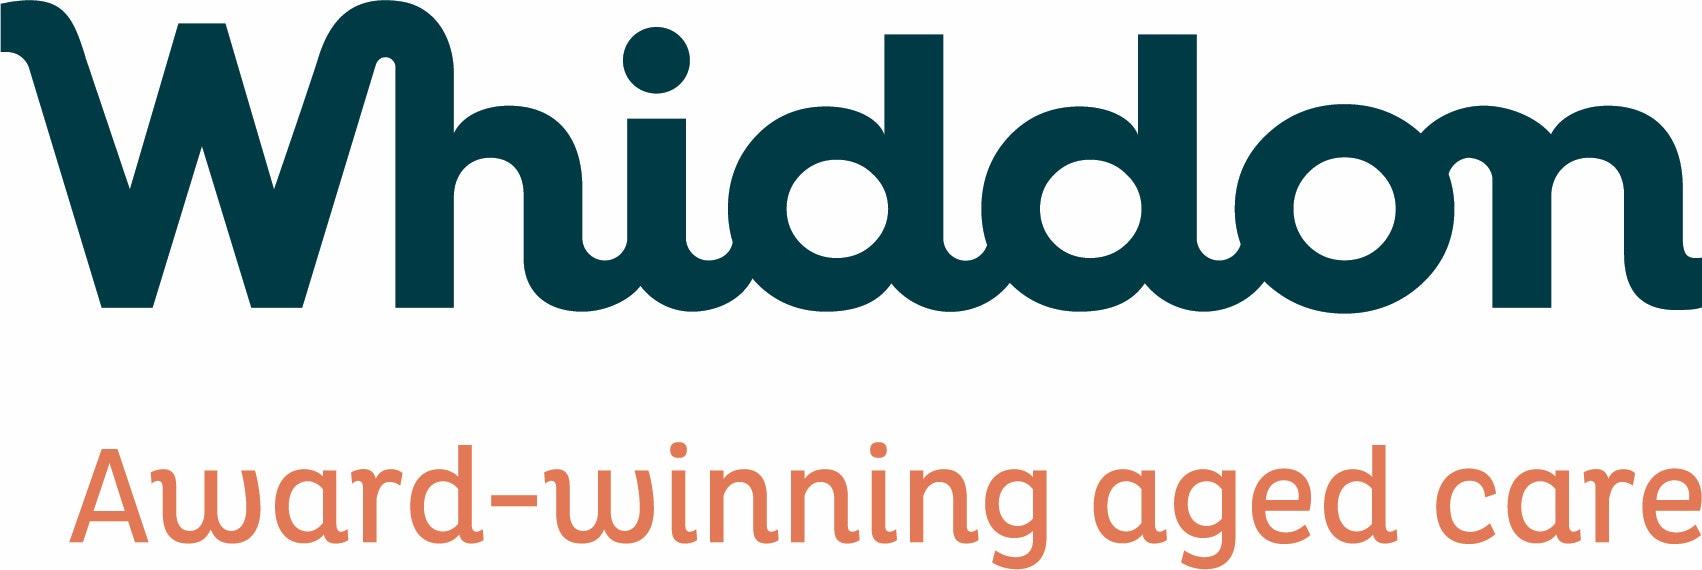 Whiddon Kyogle logo